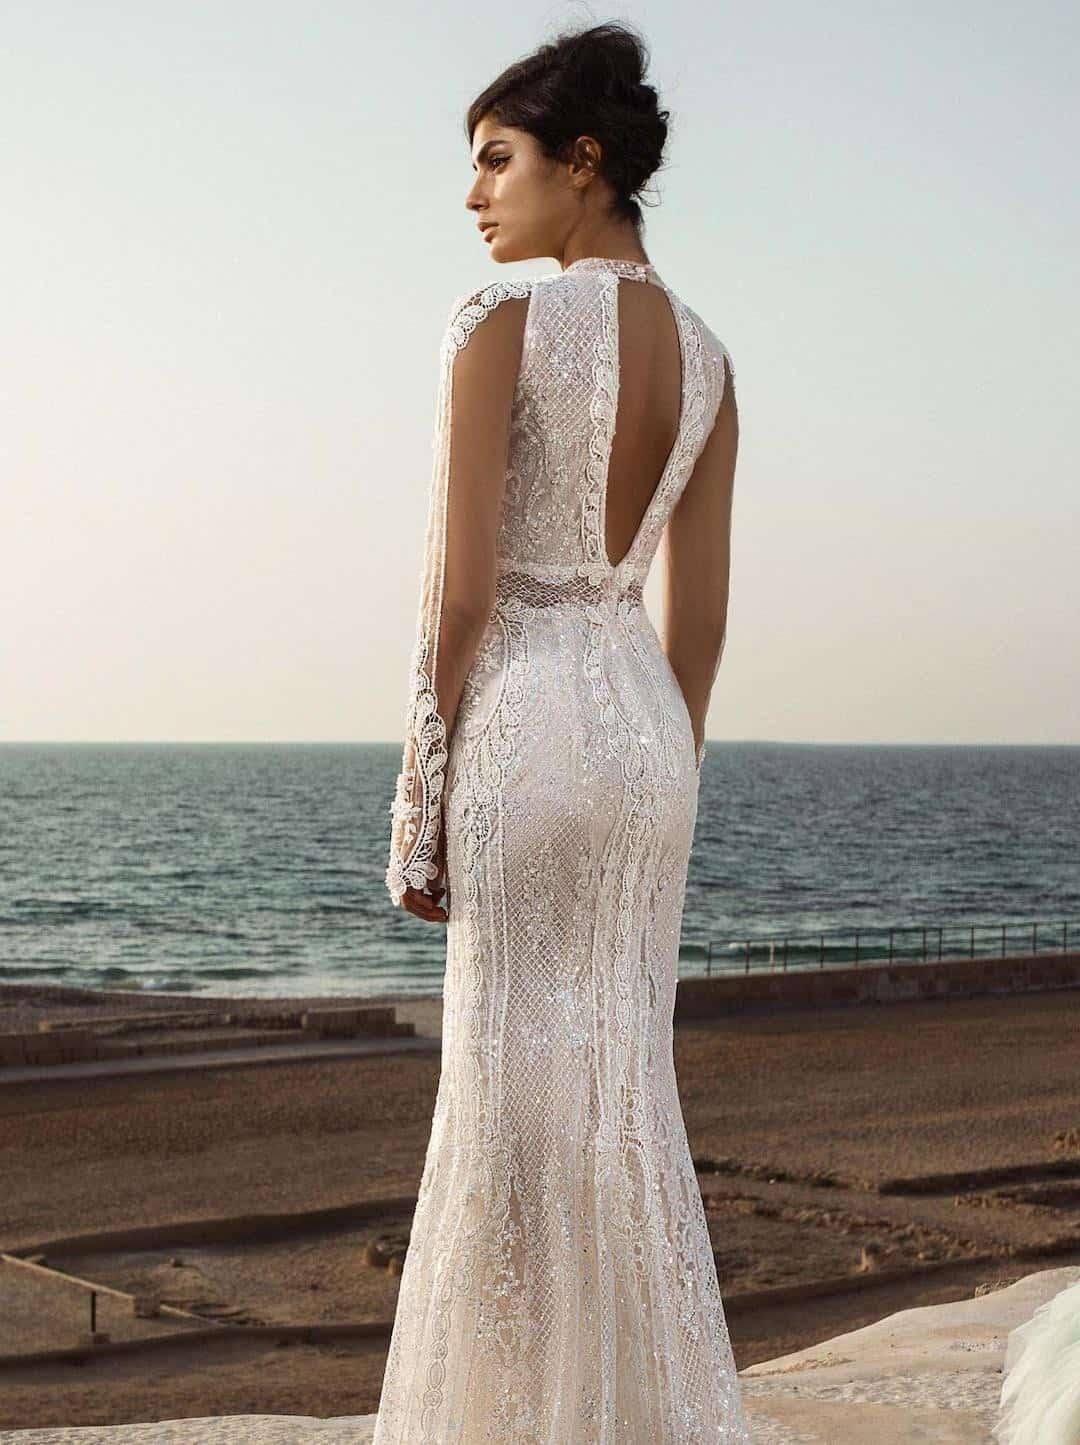 Haute Couture Wedding Dresses - Gala-805-back